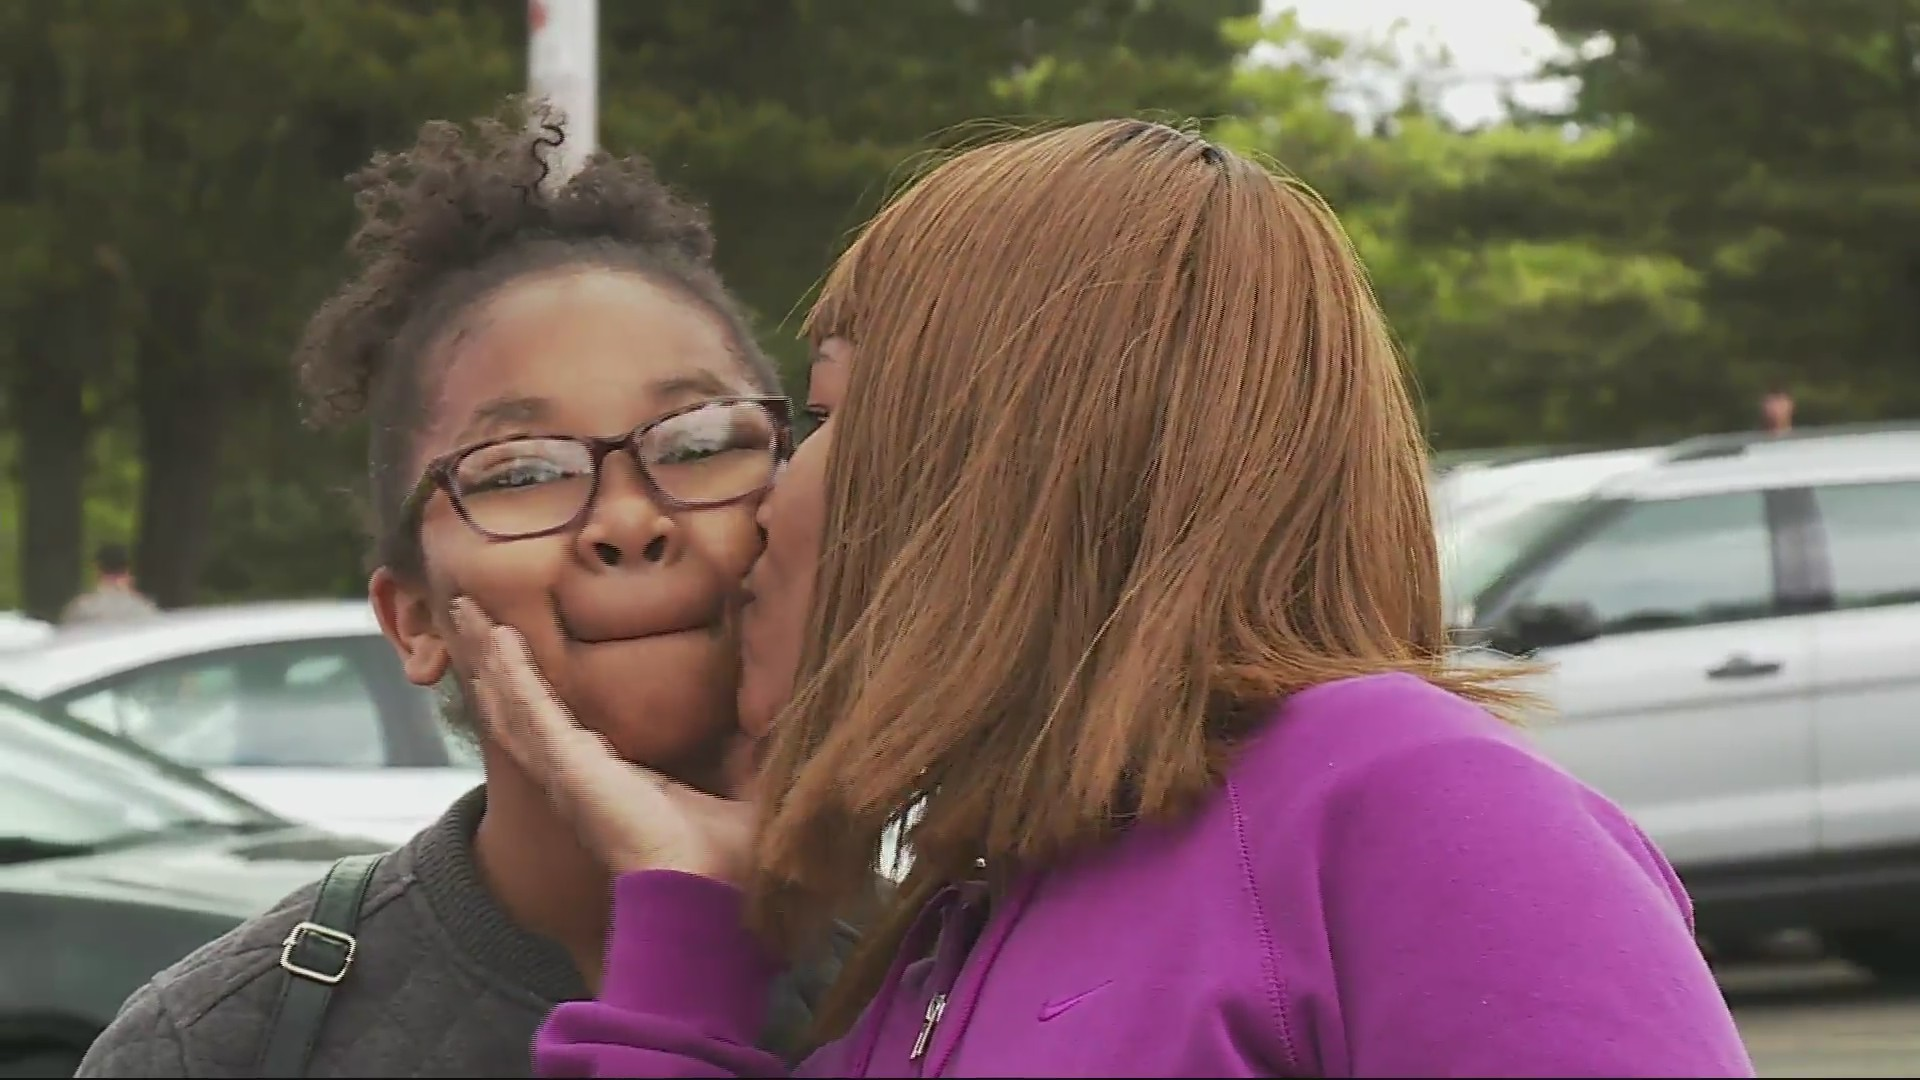 Parents pick up Parkrose High School students after gunman arrested